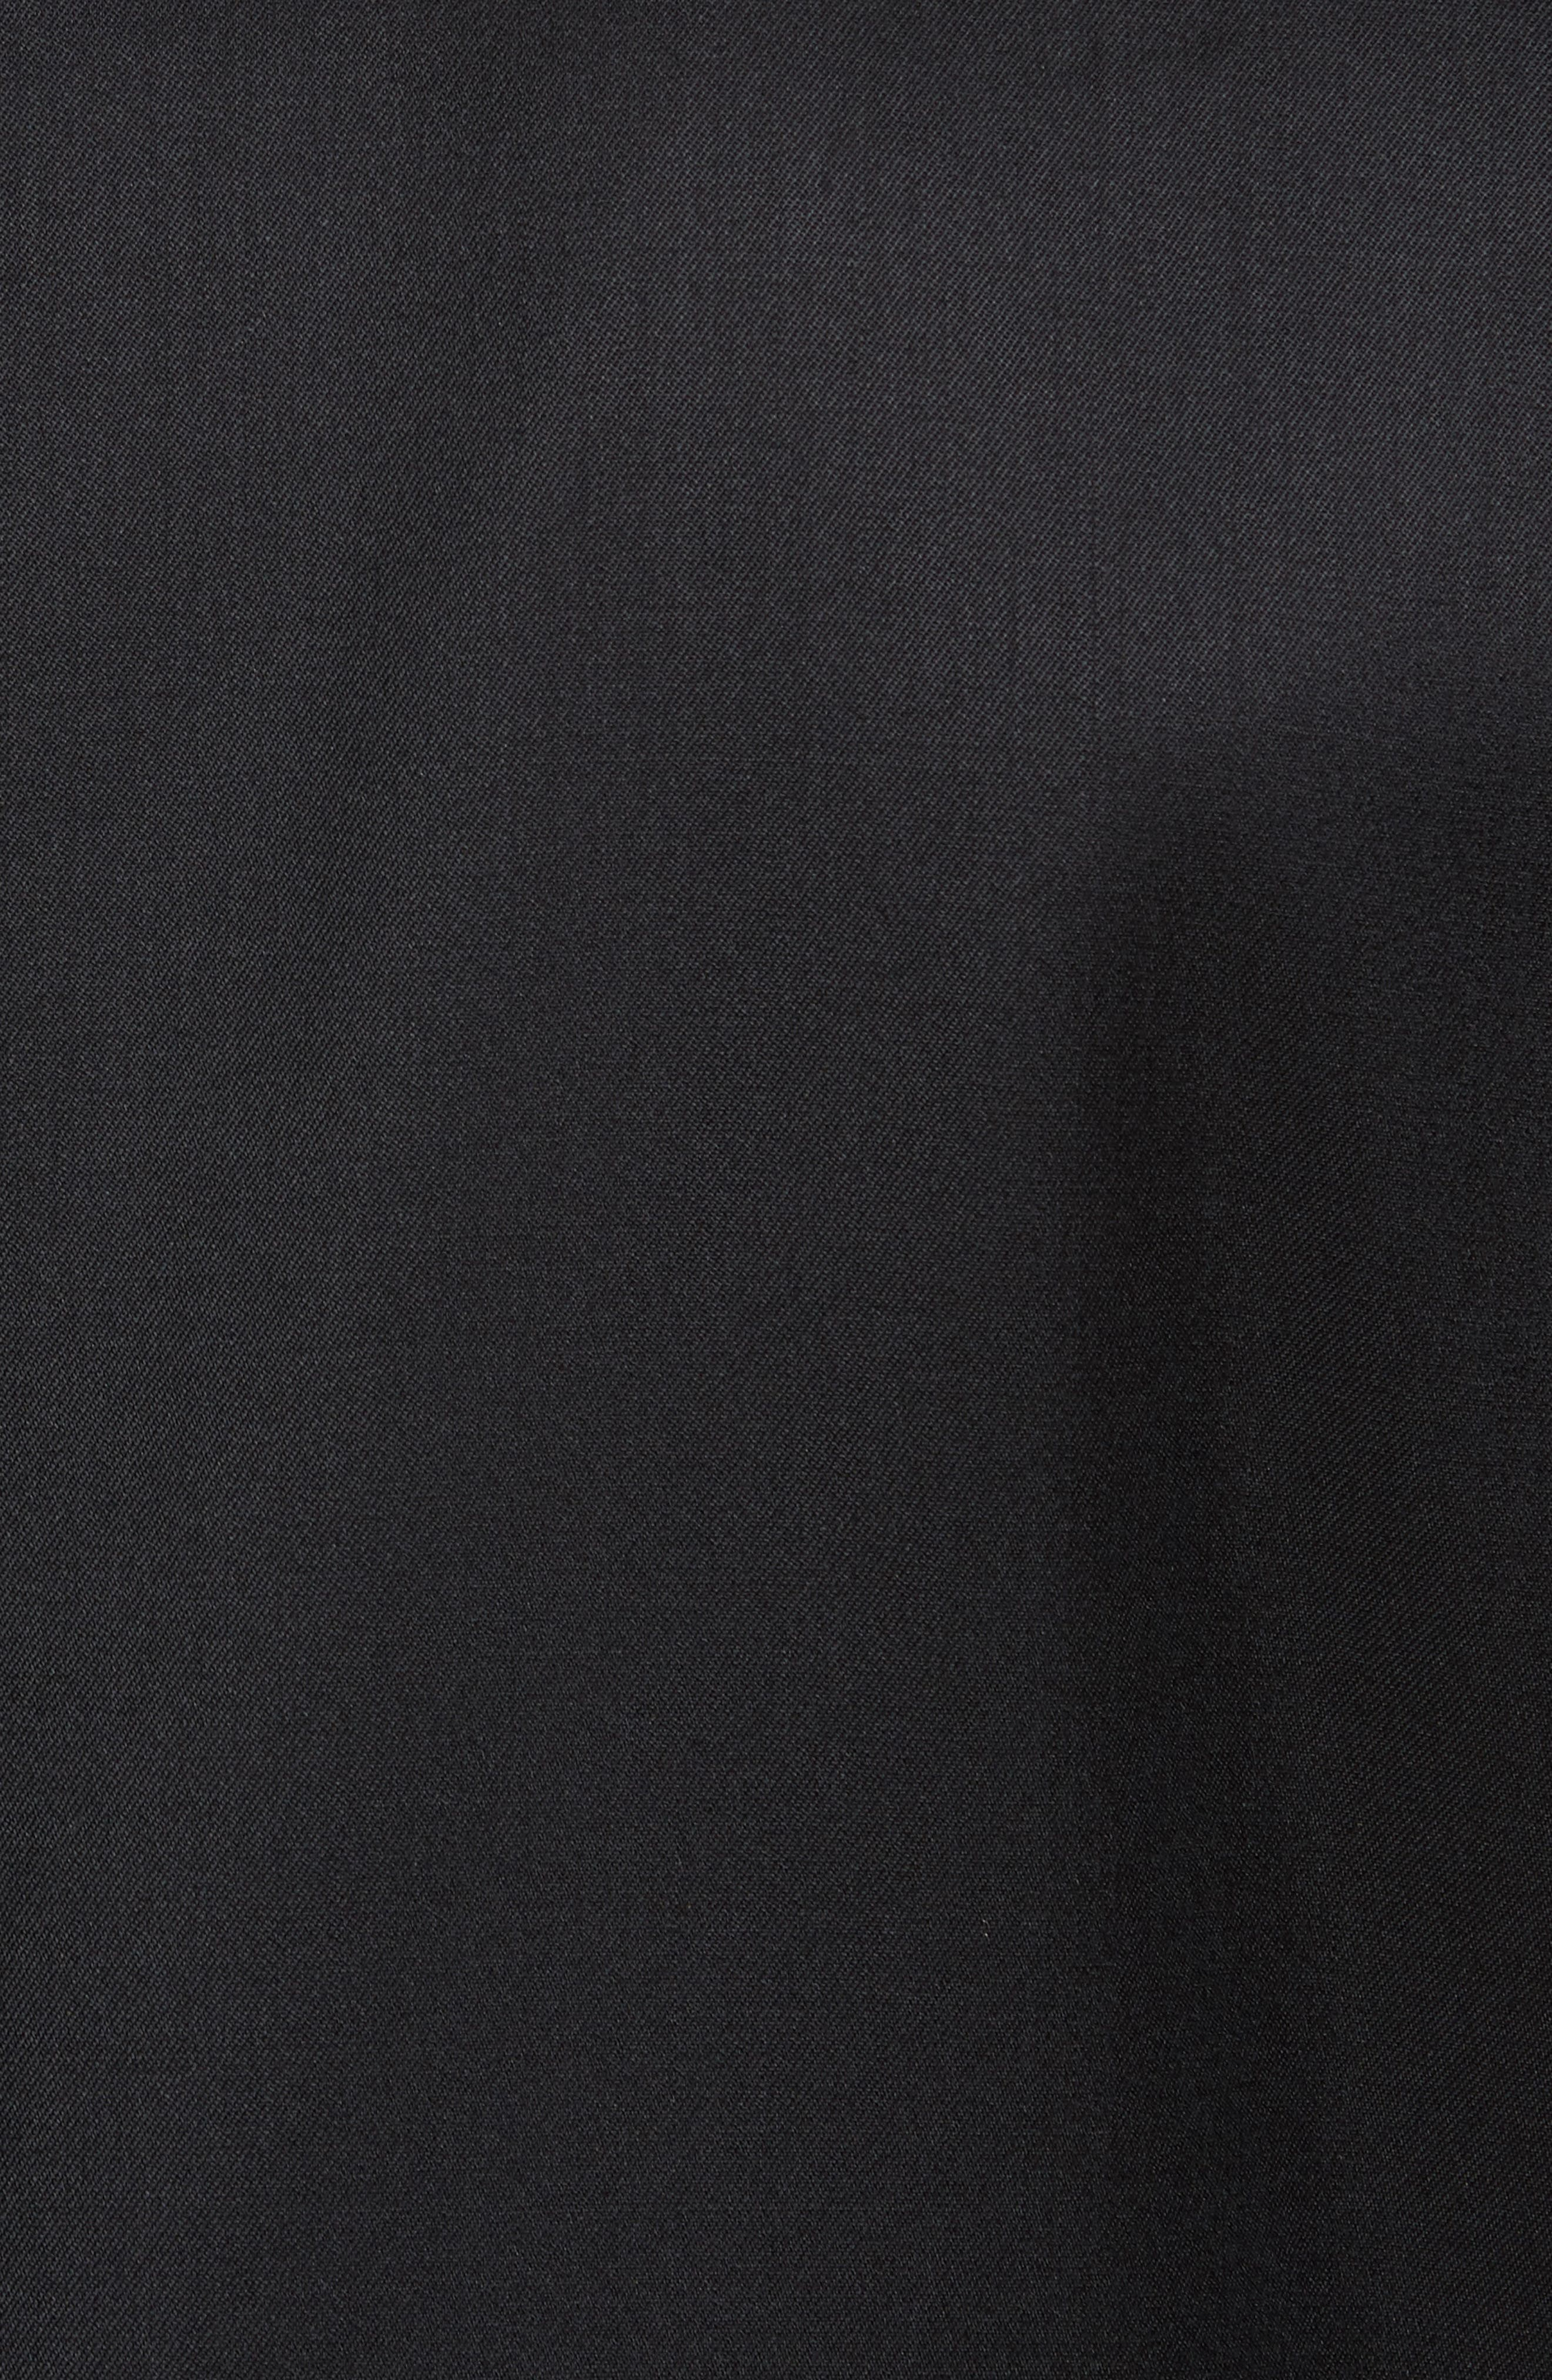 Trim Fit Wool & Mohair Dinner Jacket,                             Alternate thumbnail 6, color,                             BLACK